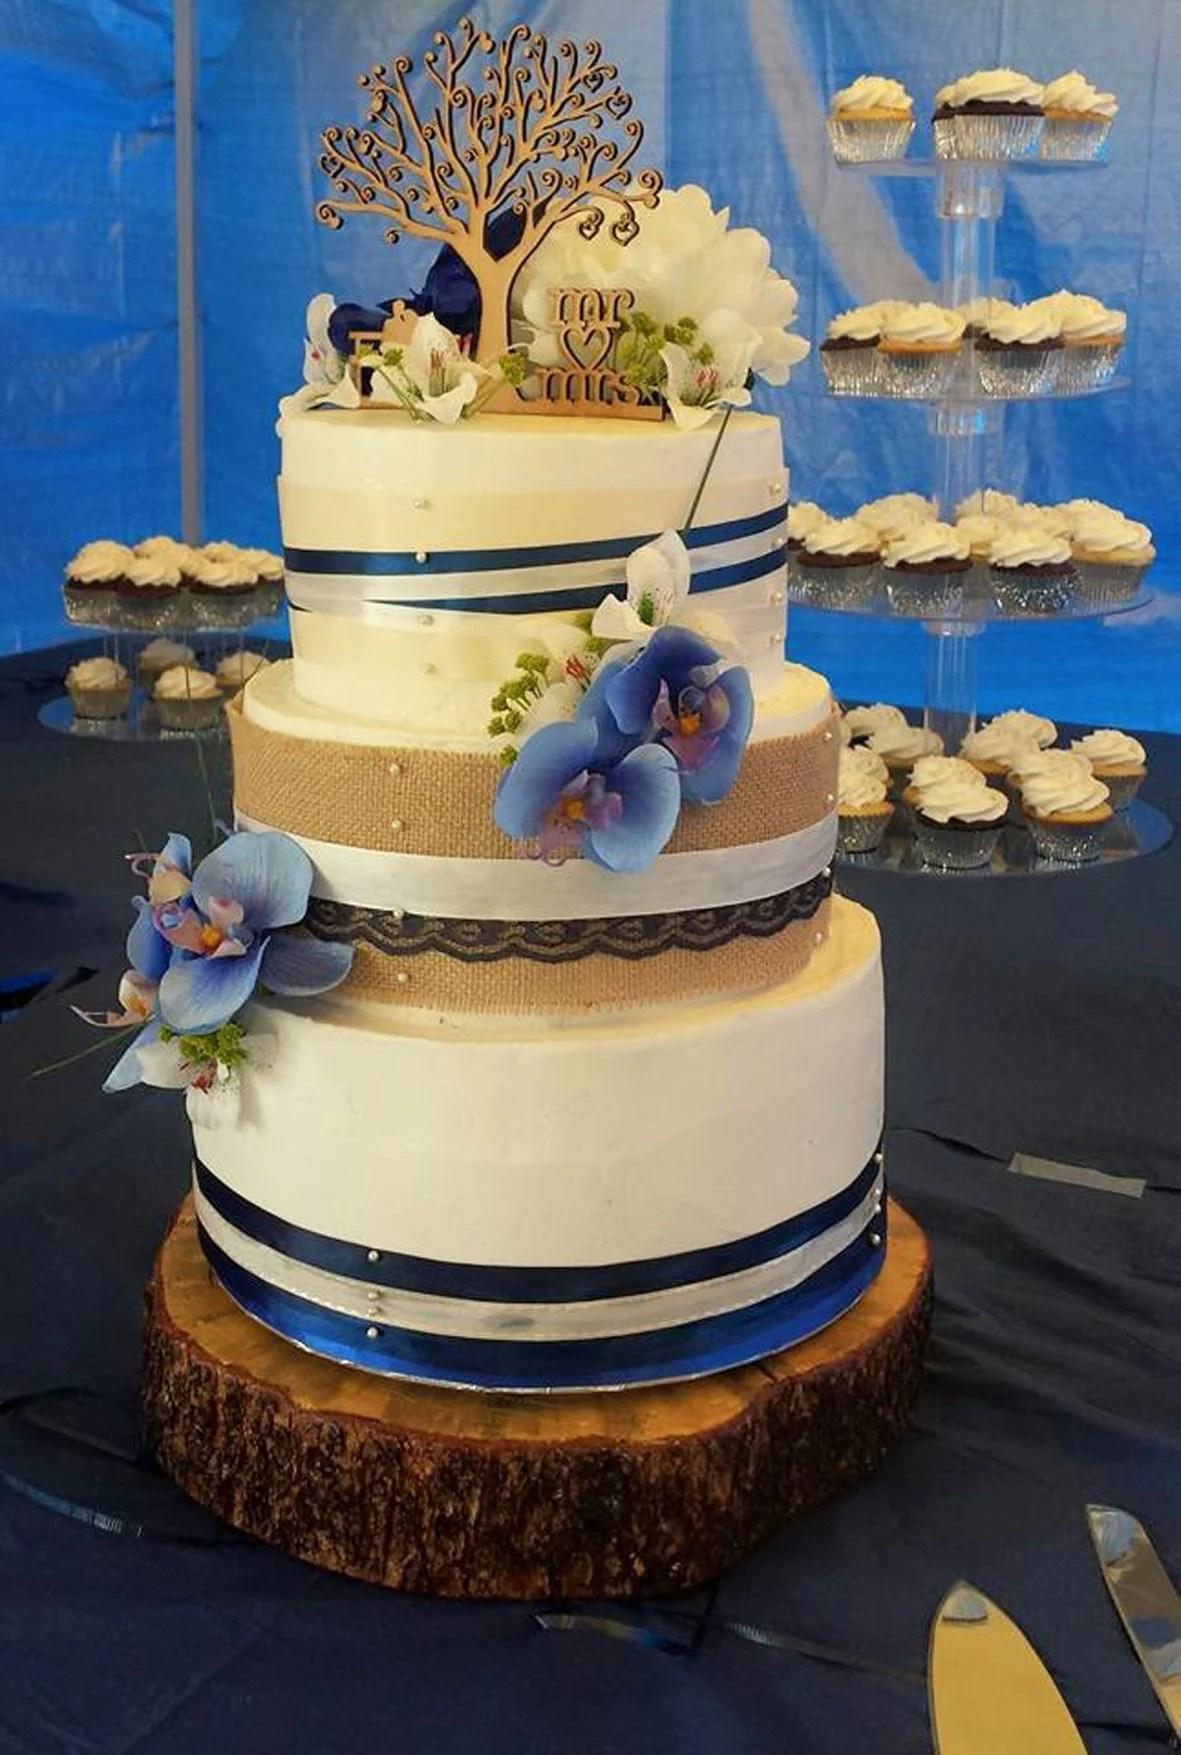 Bakery Makes Cakes